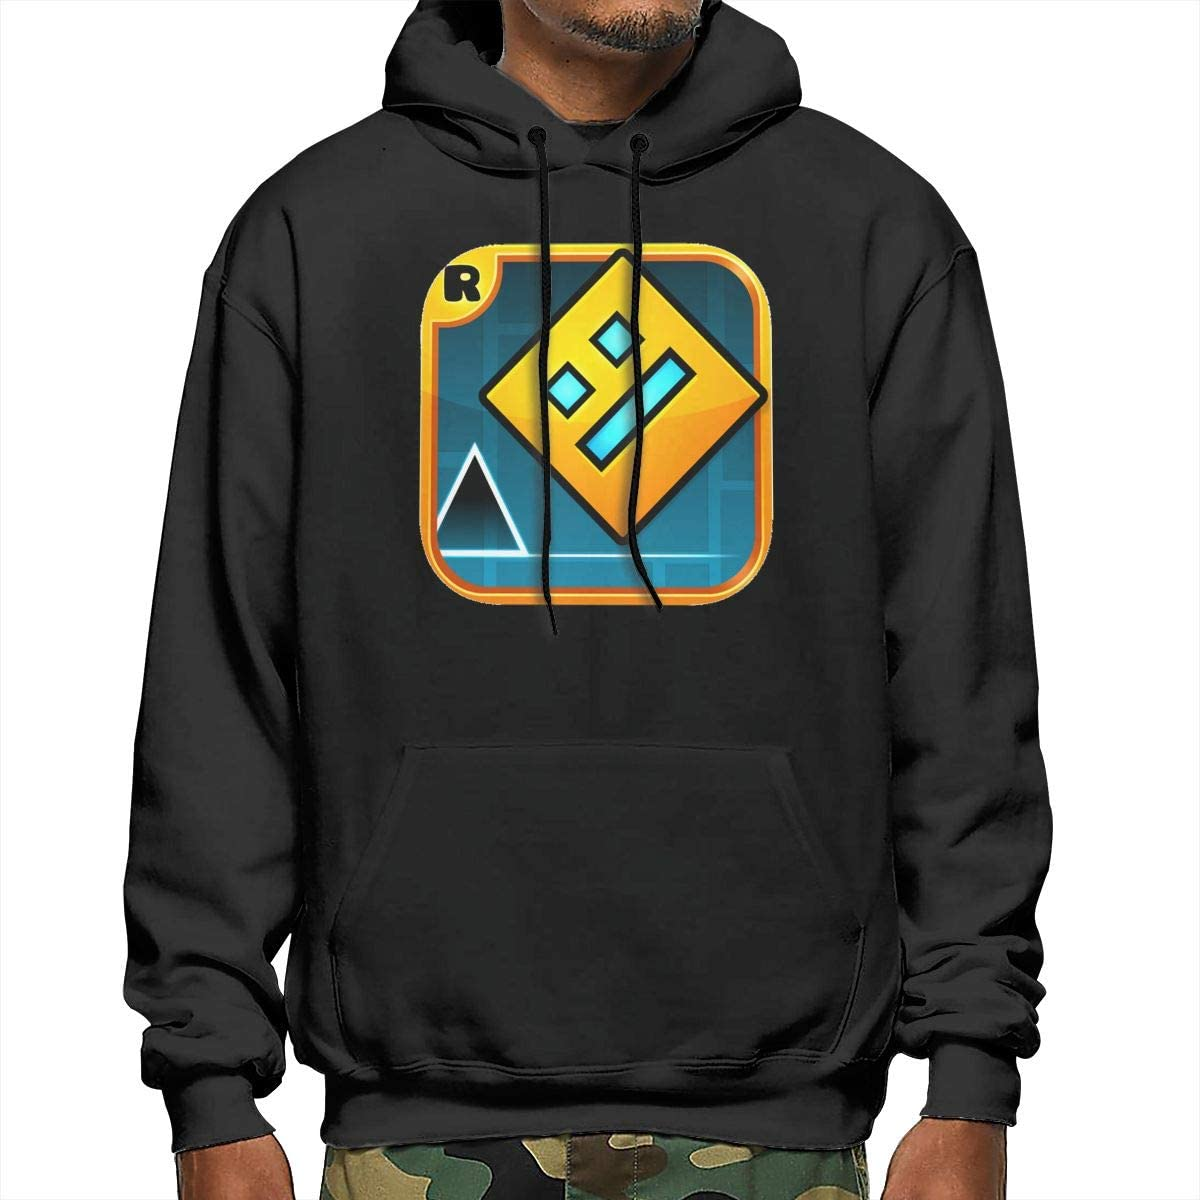 NOT Geometry Dash Men's/Boys Hoodies Long Sleeve Pocket Drawstring Sweatshirt